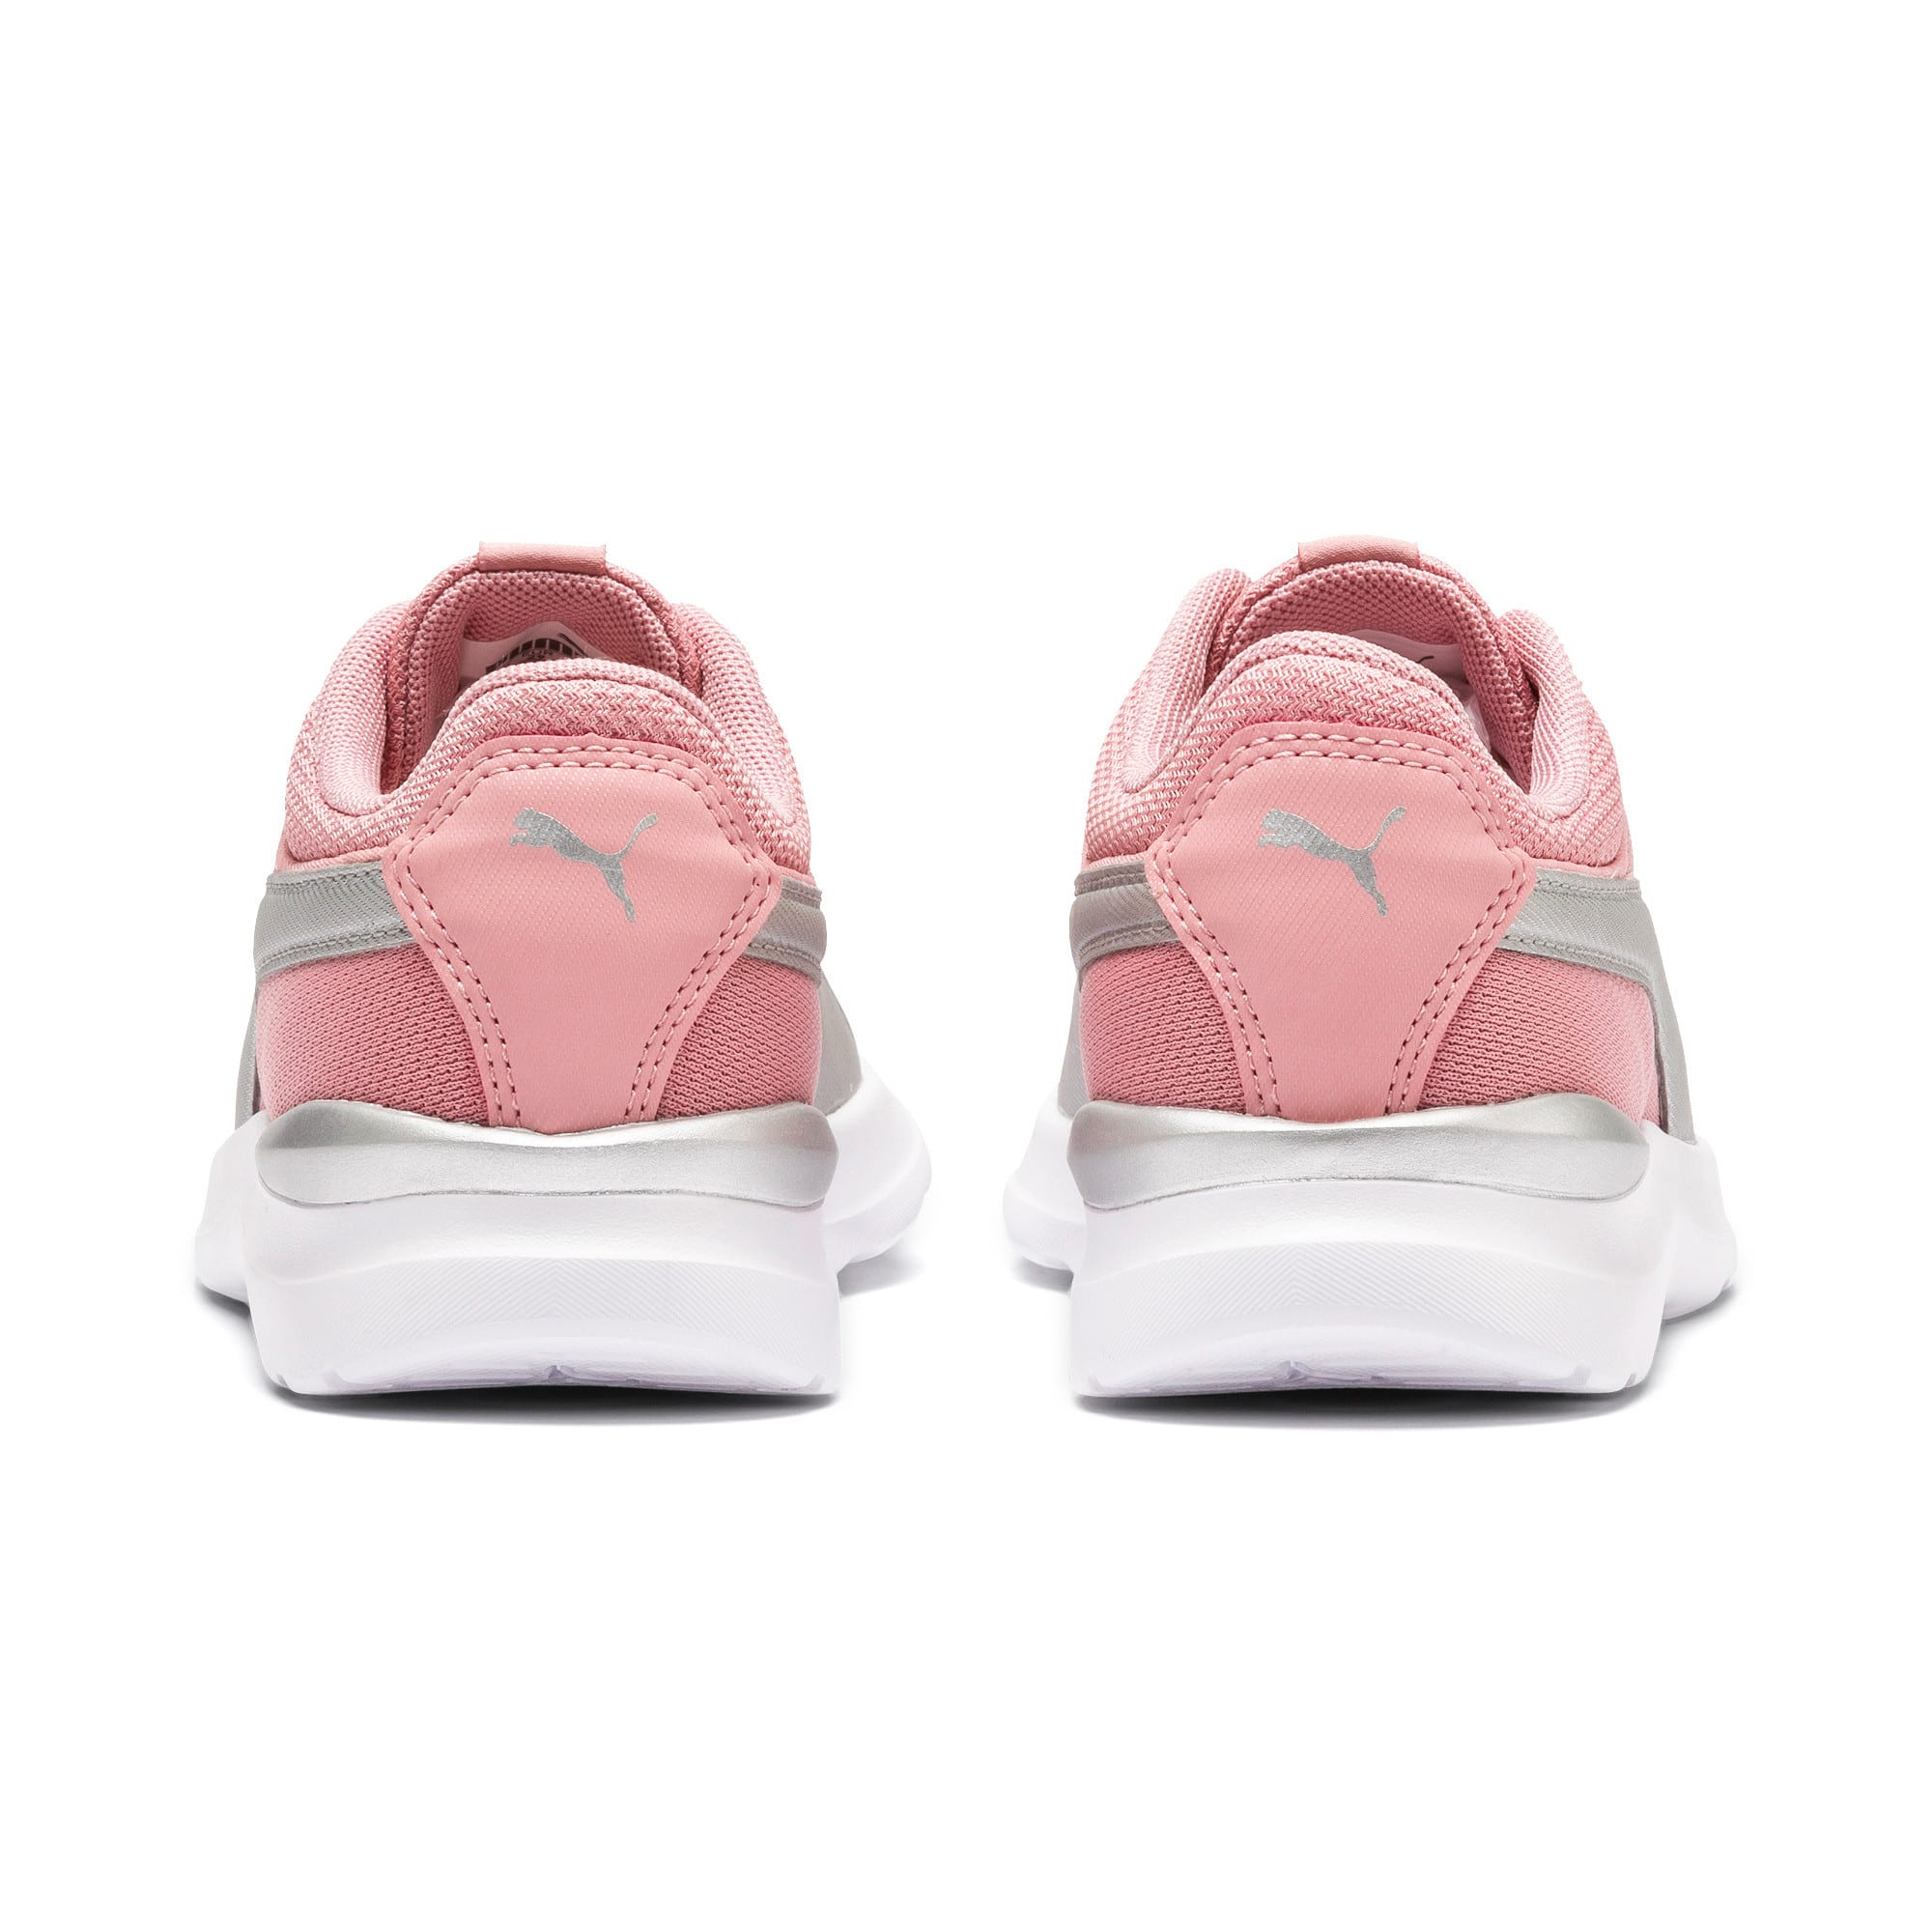 Thumbnail 3 of Adela Breathe AC Sneakers PS, Bridal Rose-Puma Silver, medium